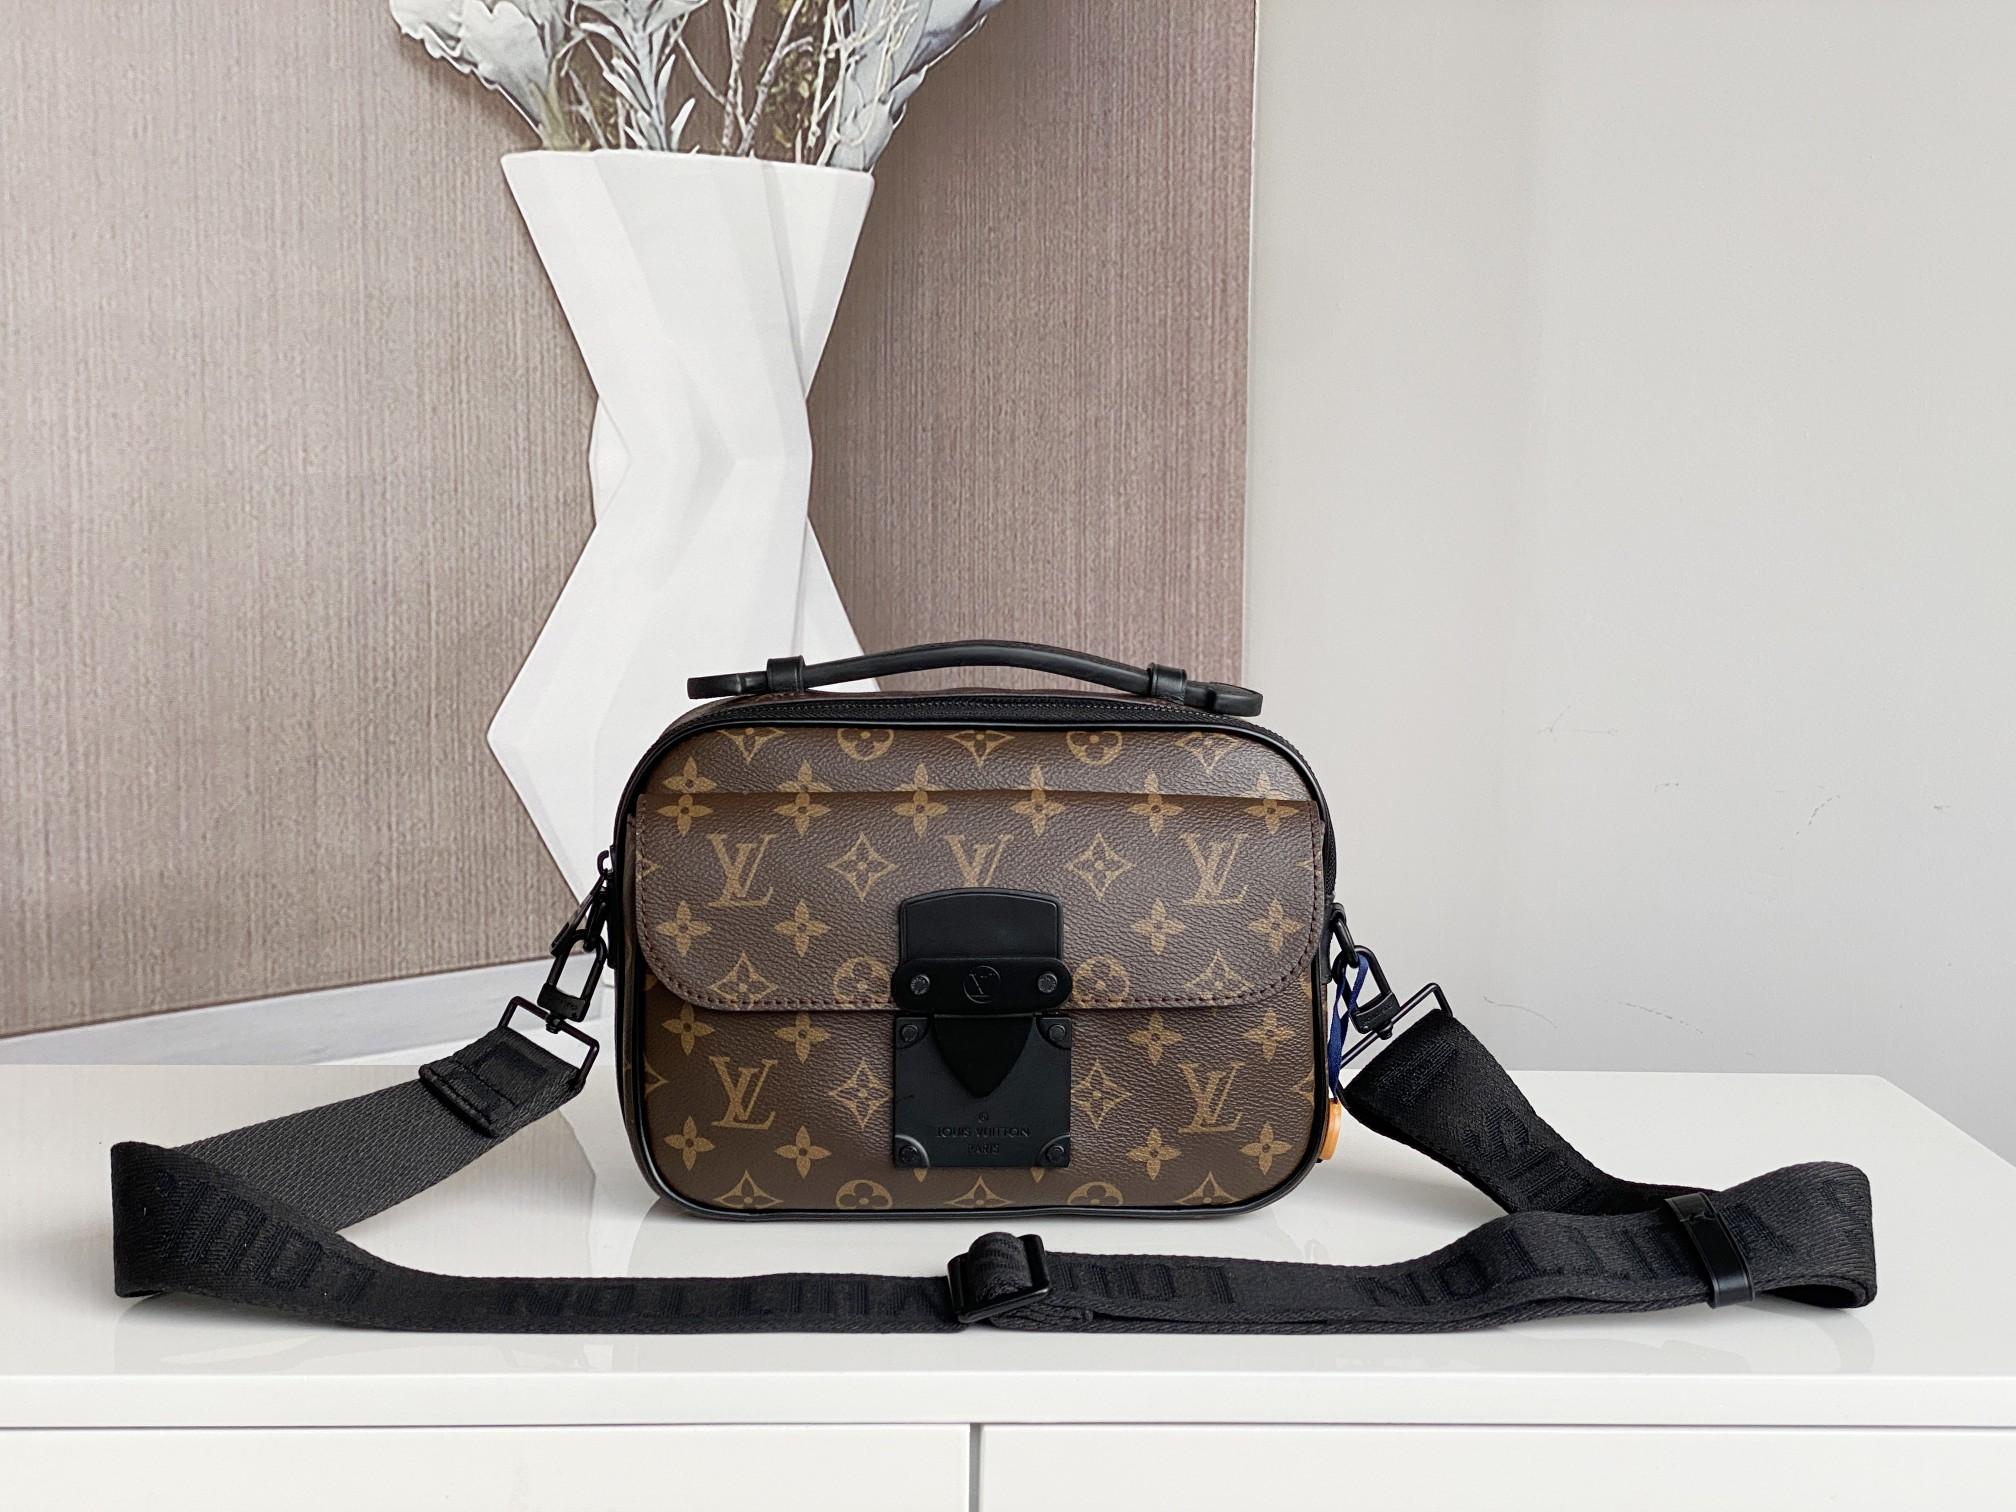 Replica Louis Vuitton M45806 S Lock Messenger Monogram Macassar Black